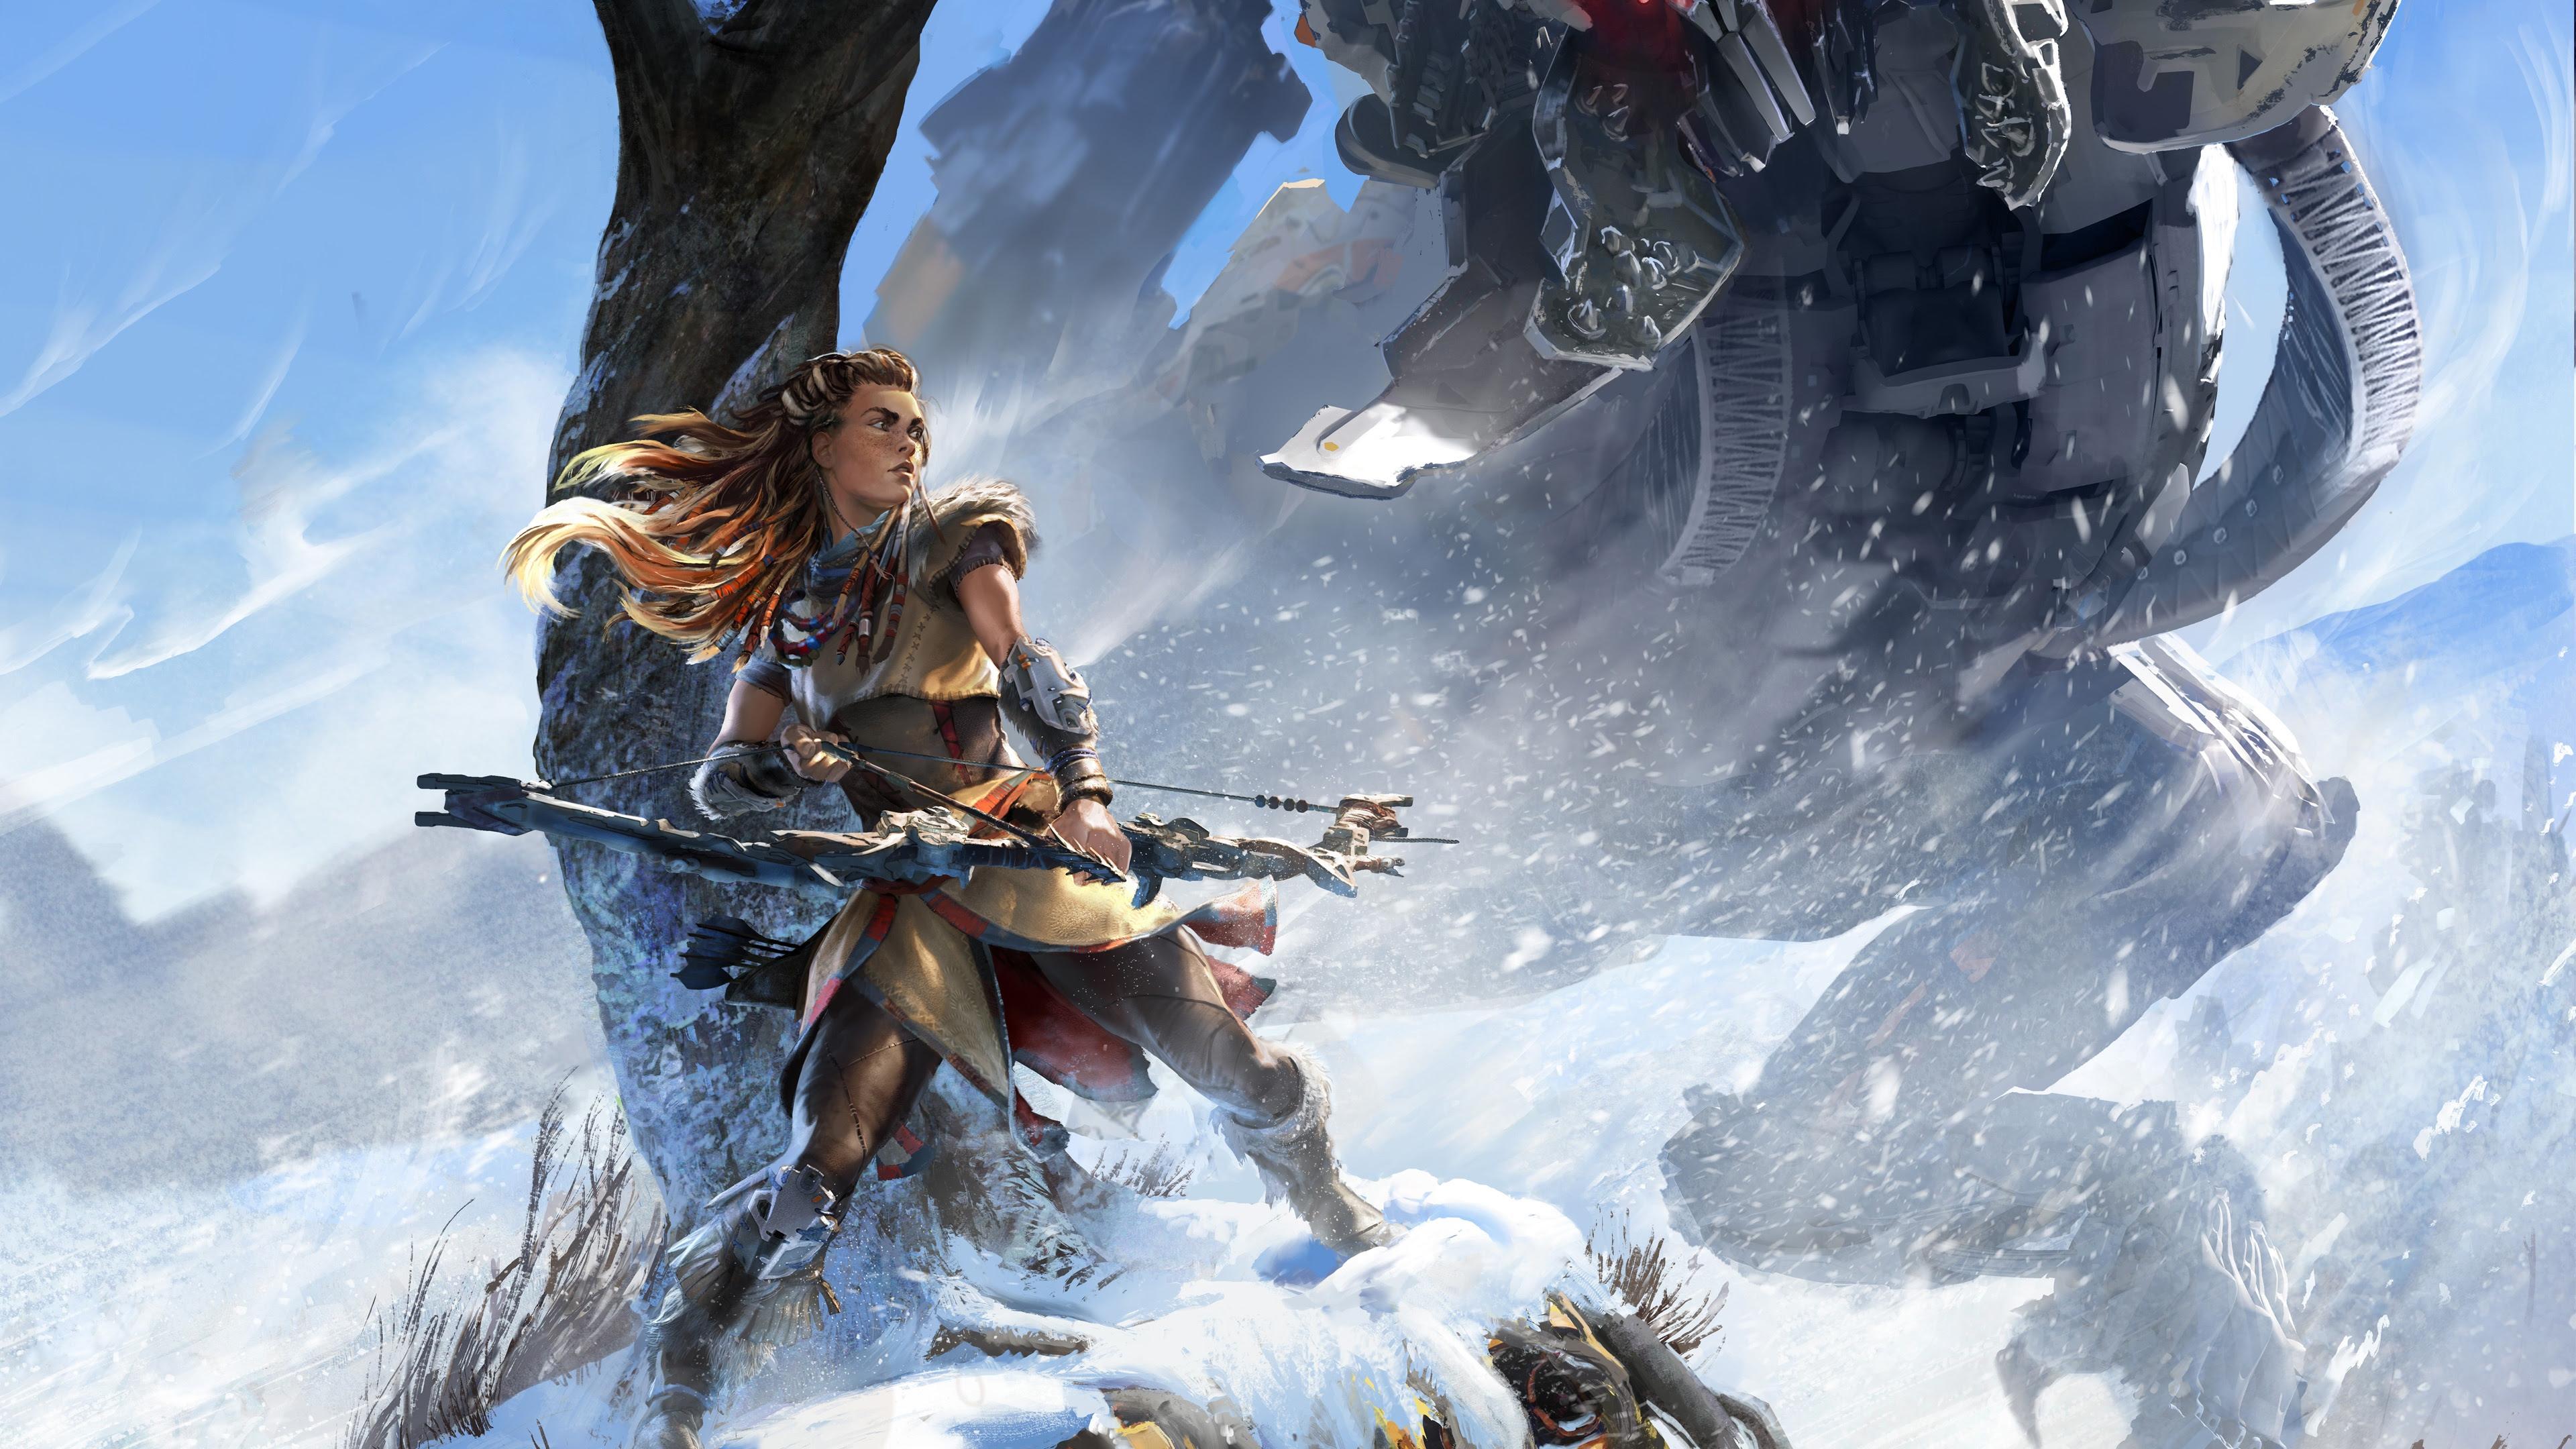 4K Horizon Zero Dawn, HD Games, 4k Wallpapers, Images